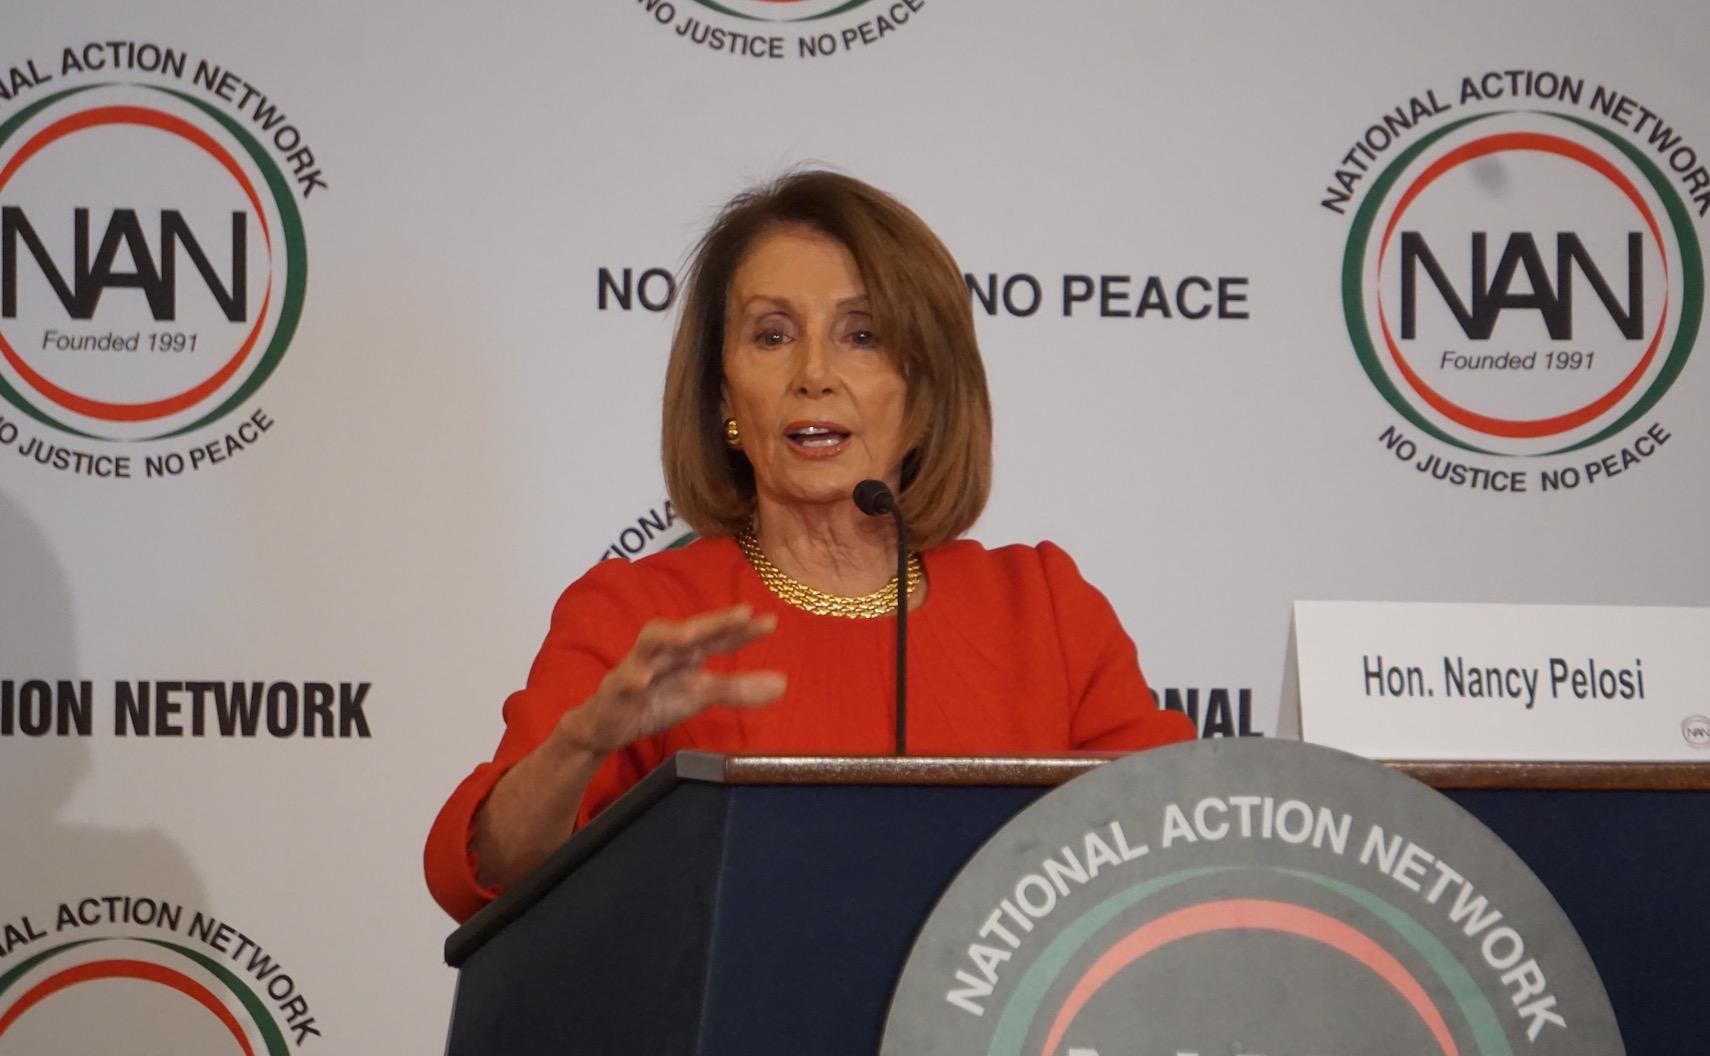 Pelosi, Nadler back Omar, refuse to condemn her 9/11 remark